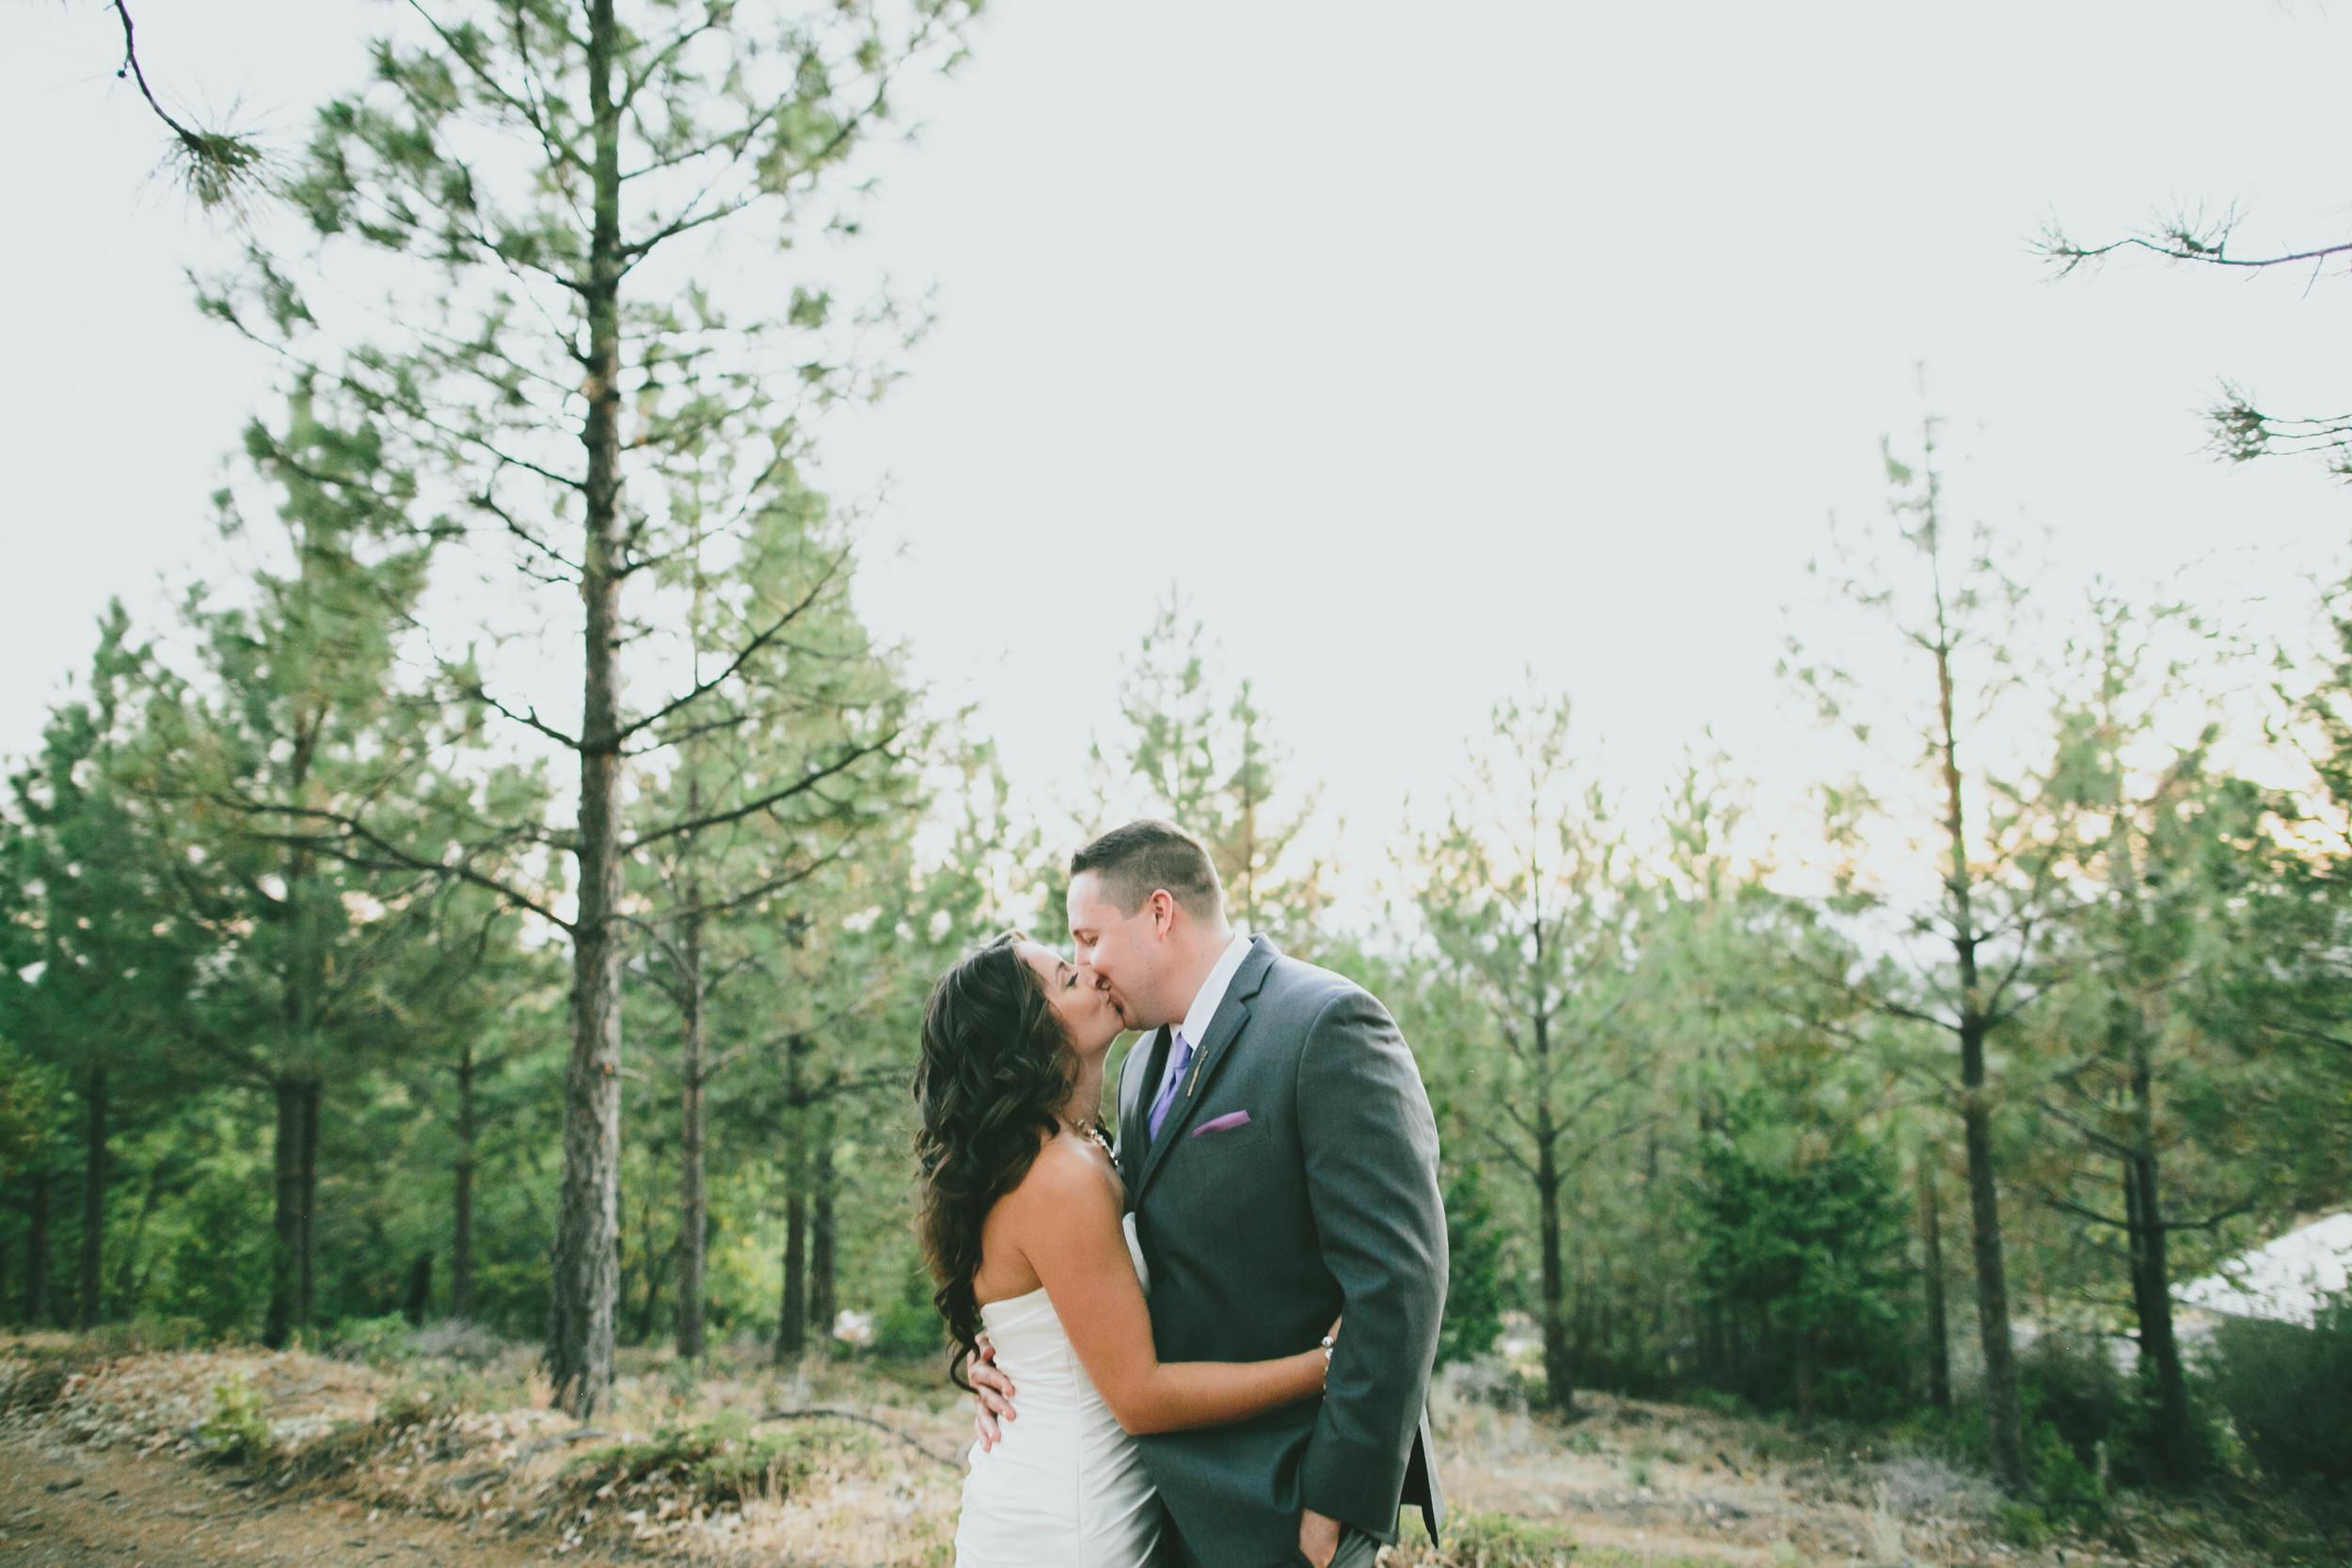 Elise+Matty-WEDDING_PRINT-527.jpg